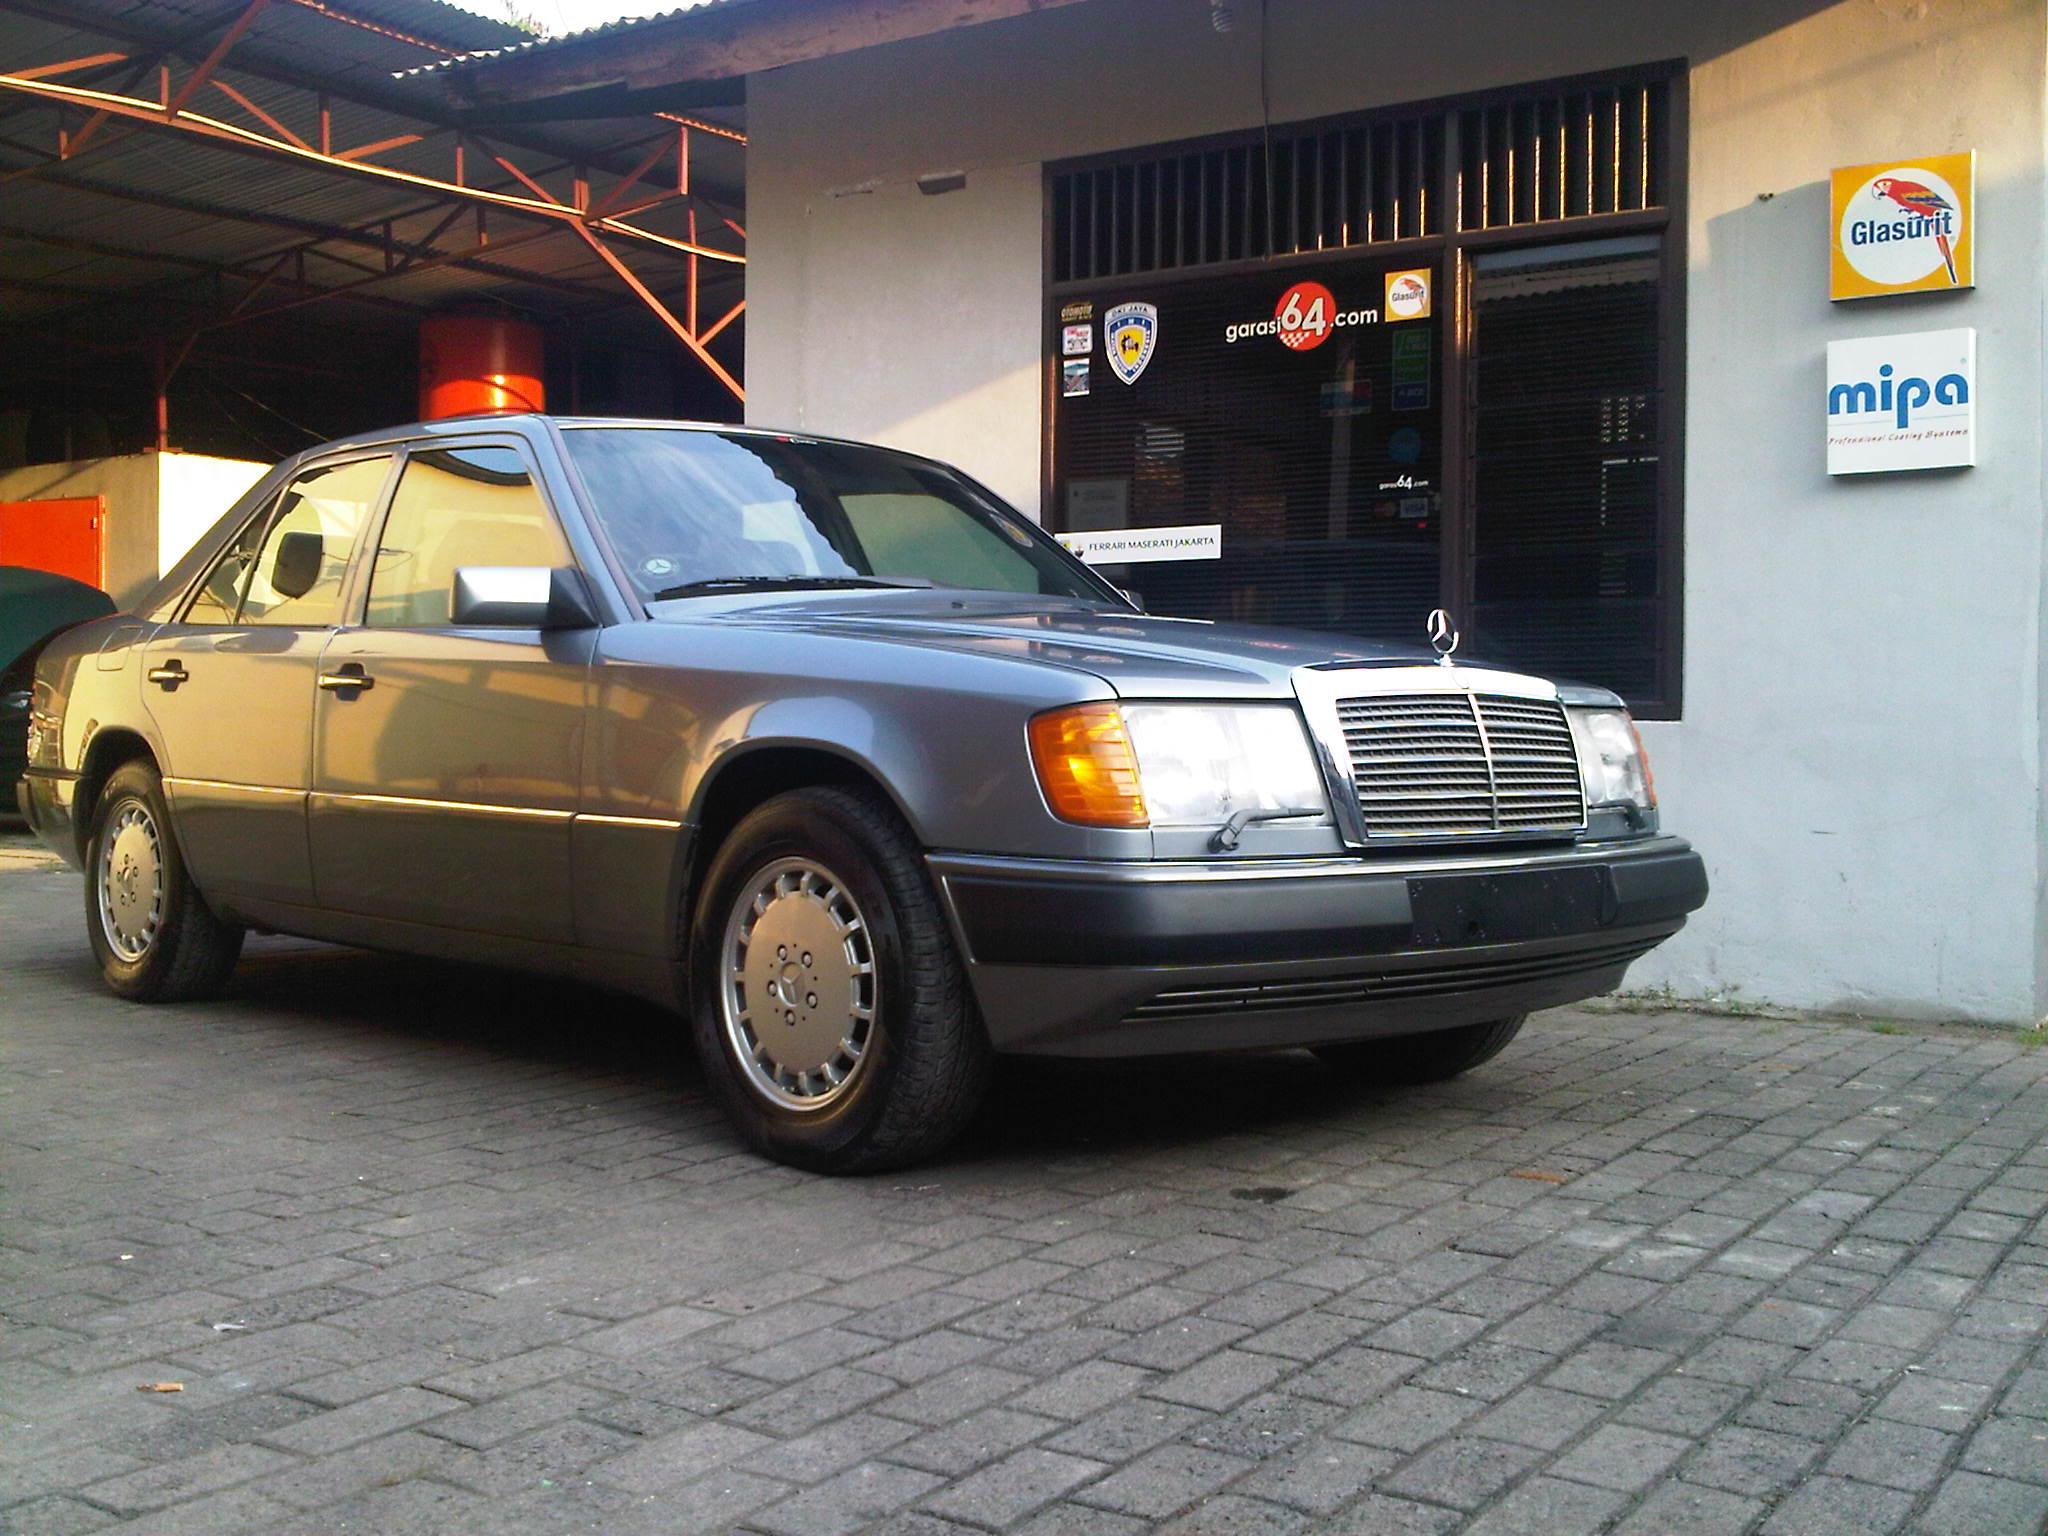 1990 mercedes benz 300e w124 garasi 64 for How much is a 1990 mercedes benz worth